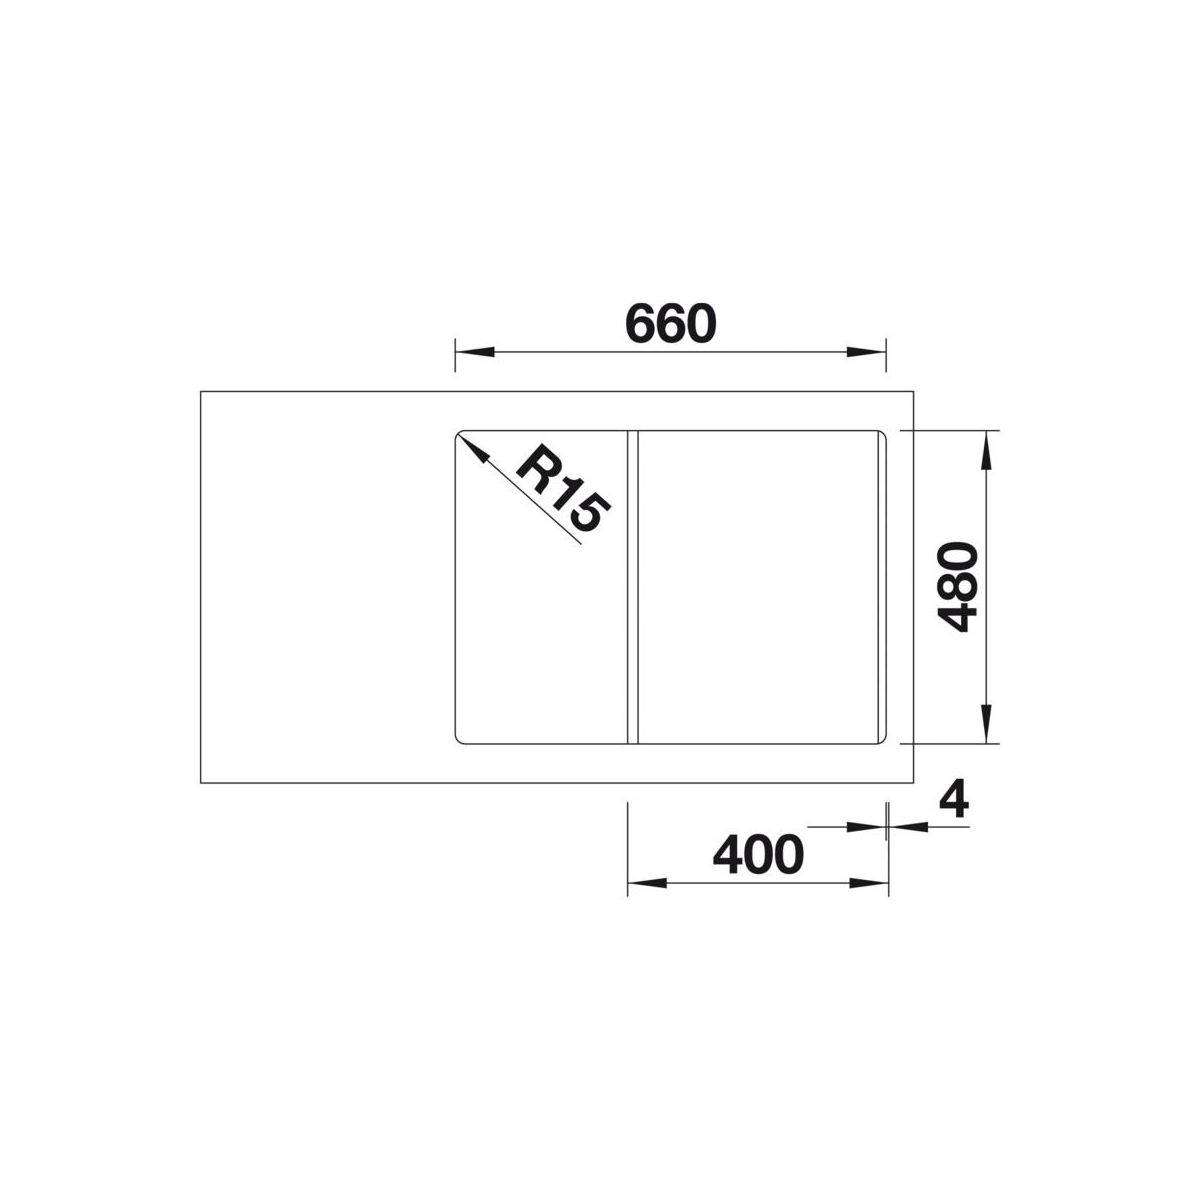 zlewozmywak lexa 40 s blanco sprawd opinie w leroy merlin. Black Bedroom Furniture Sets. Home Design Ideas